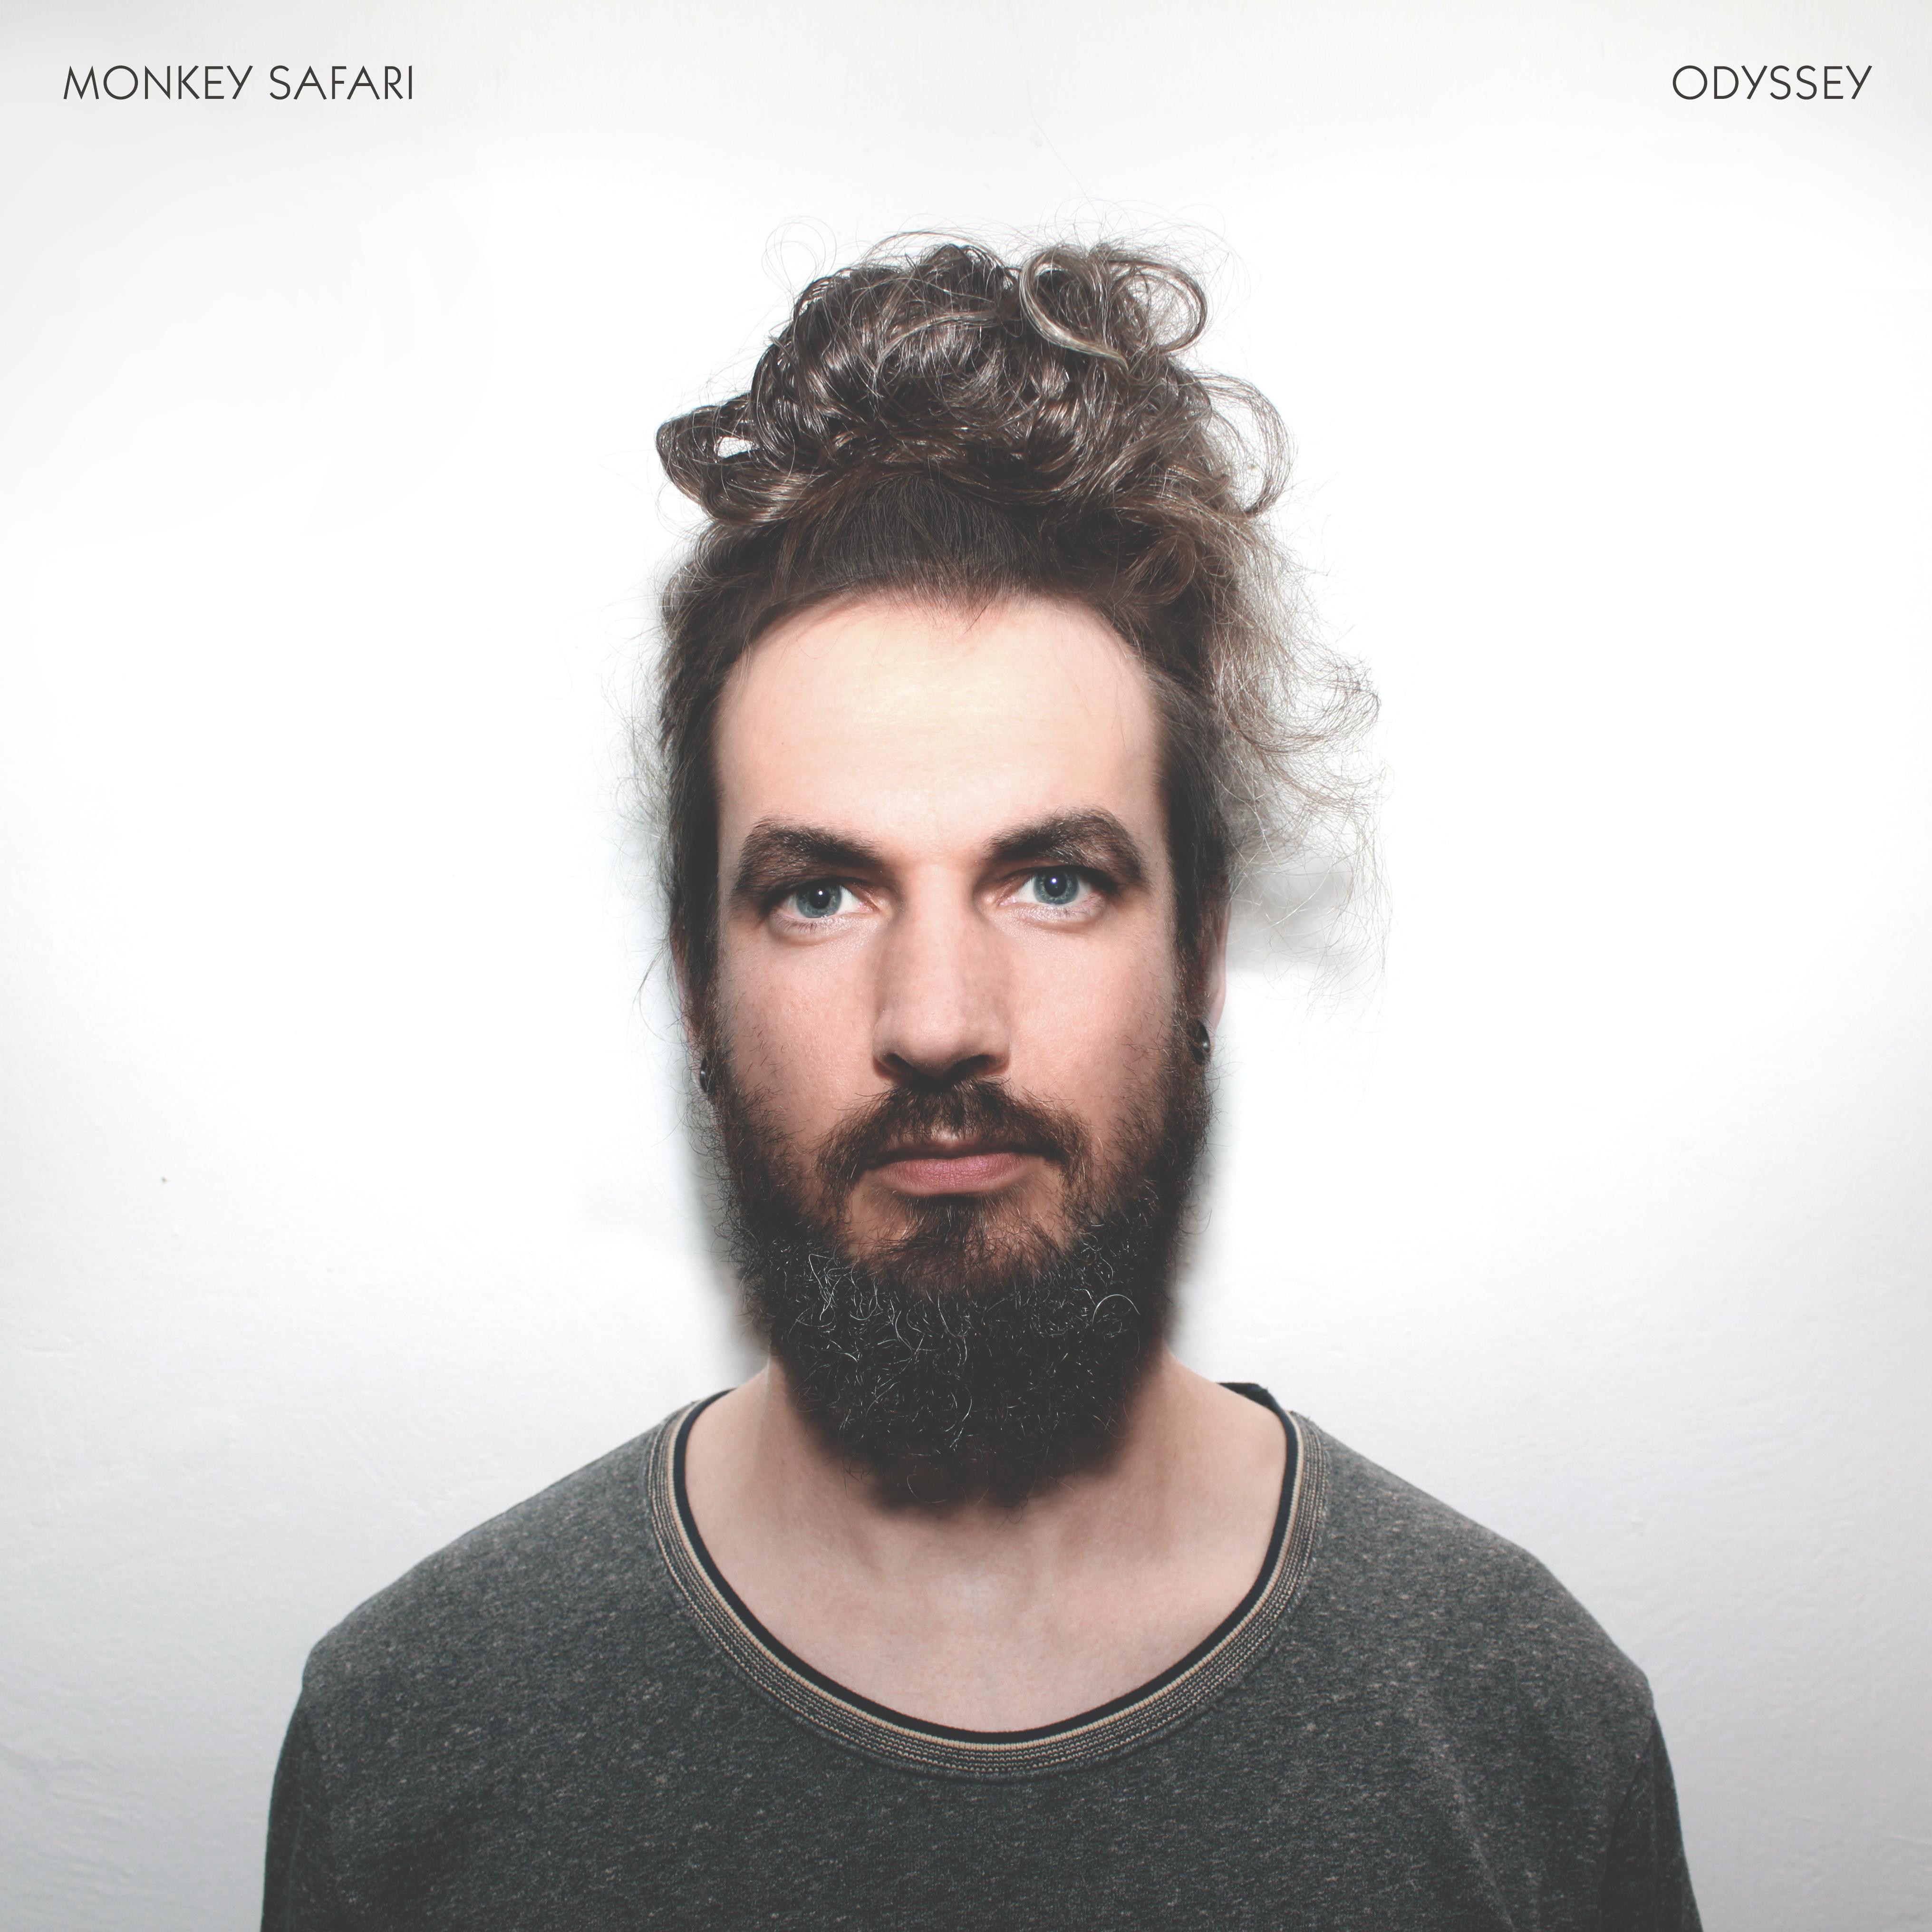 monkey-safari-odyssey-cover.jpg